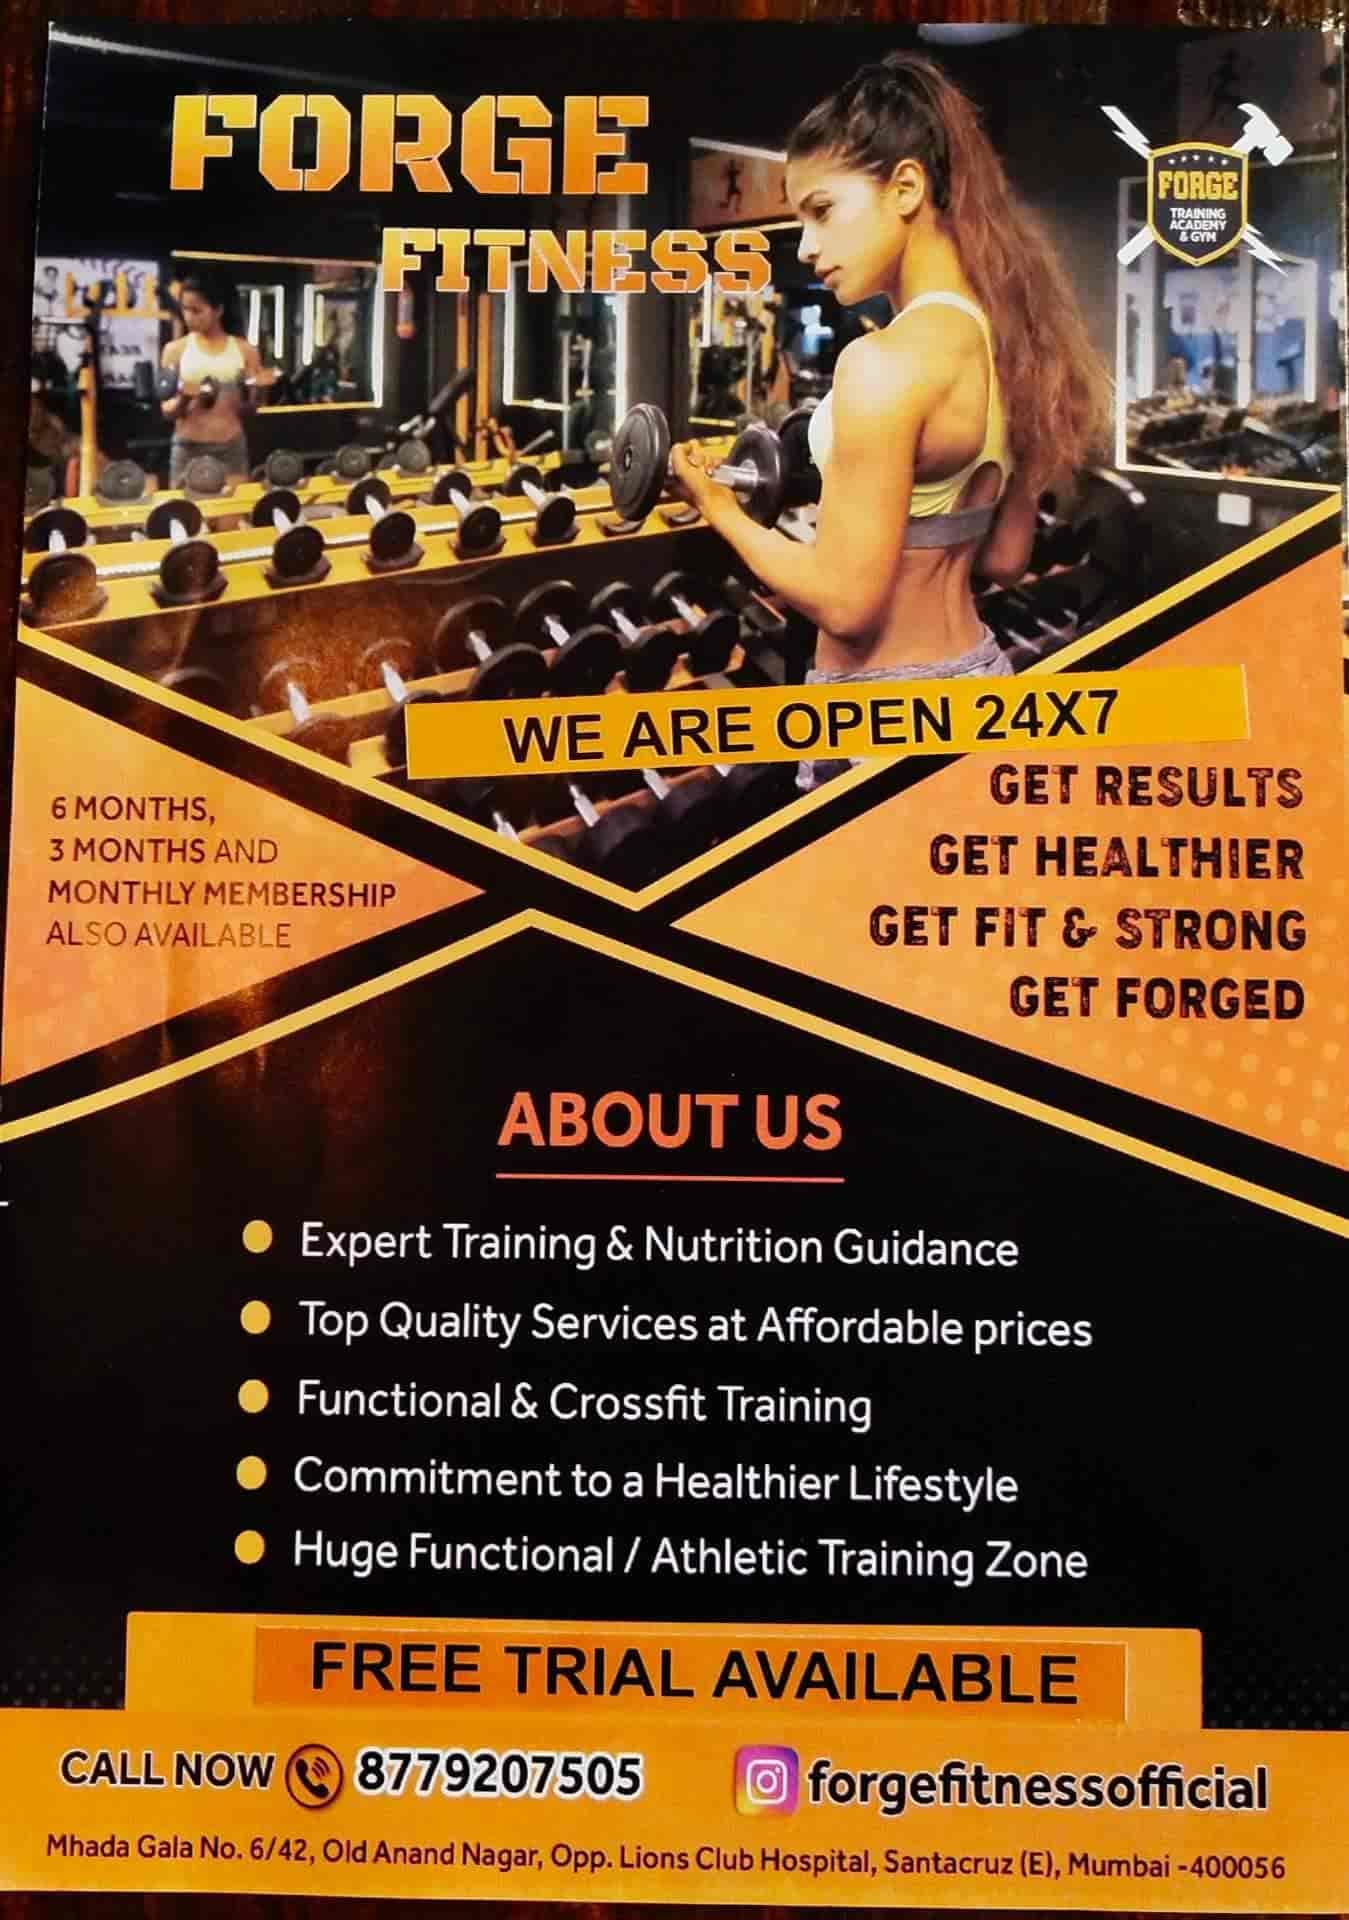 Forge Fitness, Santacruz East - Gyms in Mumbai - Justdial